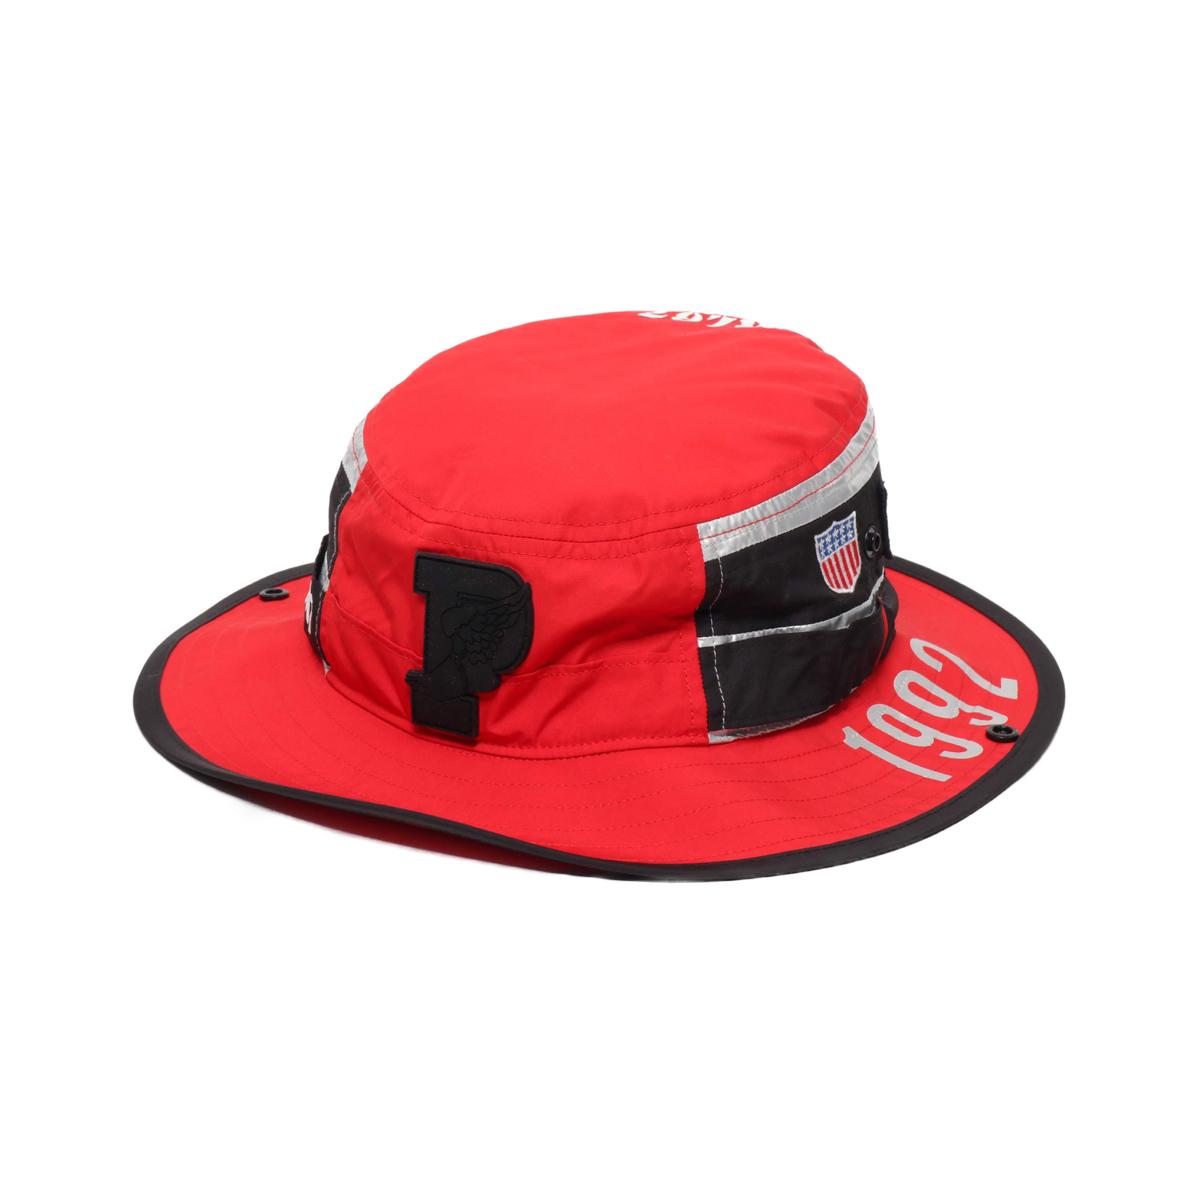 POLO RALPH LAUREN BOONEY CAP-HAT(ポロ ラルフ ブーニー ハット)RED MULTI【メンズ ハット】18HO-I